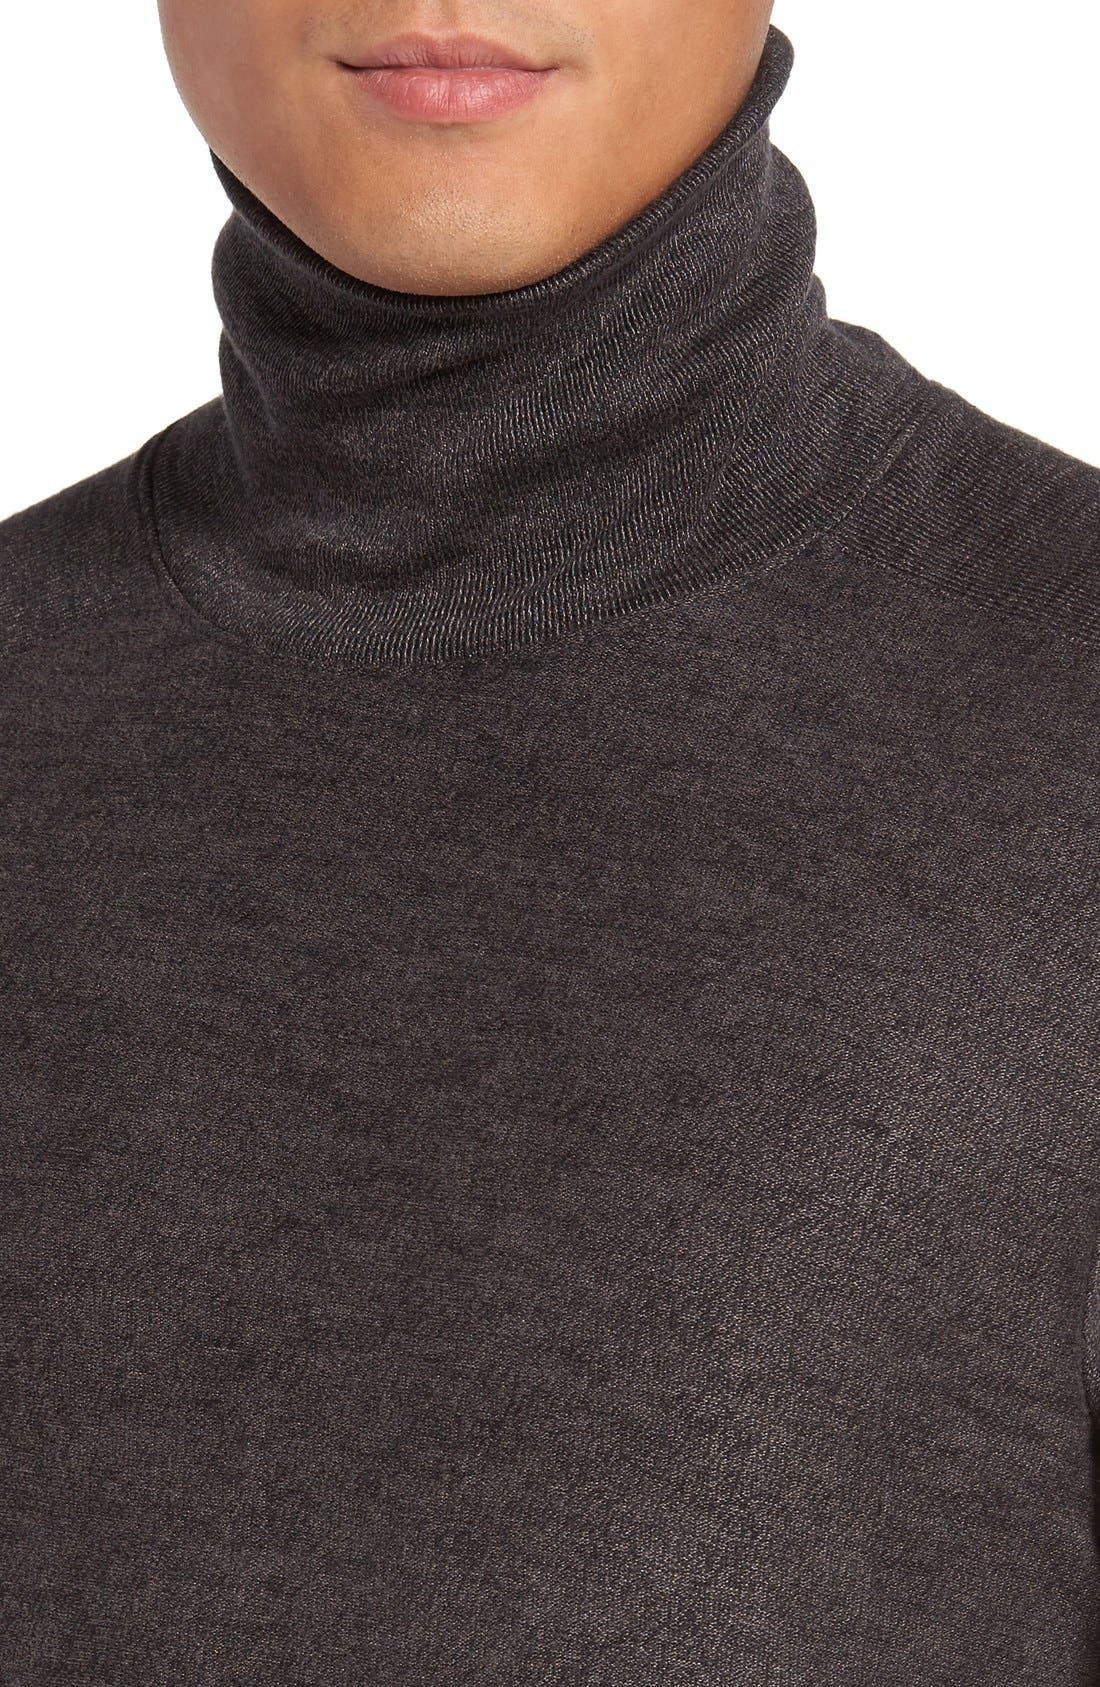 Turtleneck Sweater,                             Alternate thumbnail 4, color,                             034